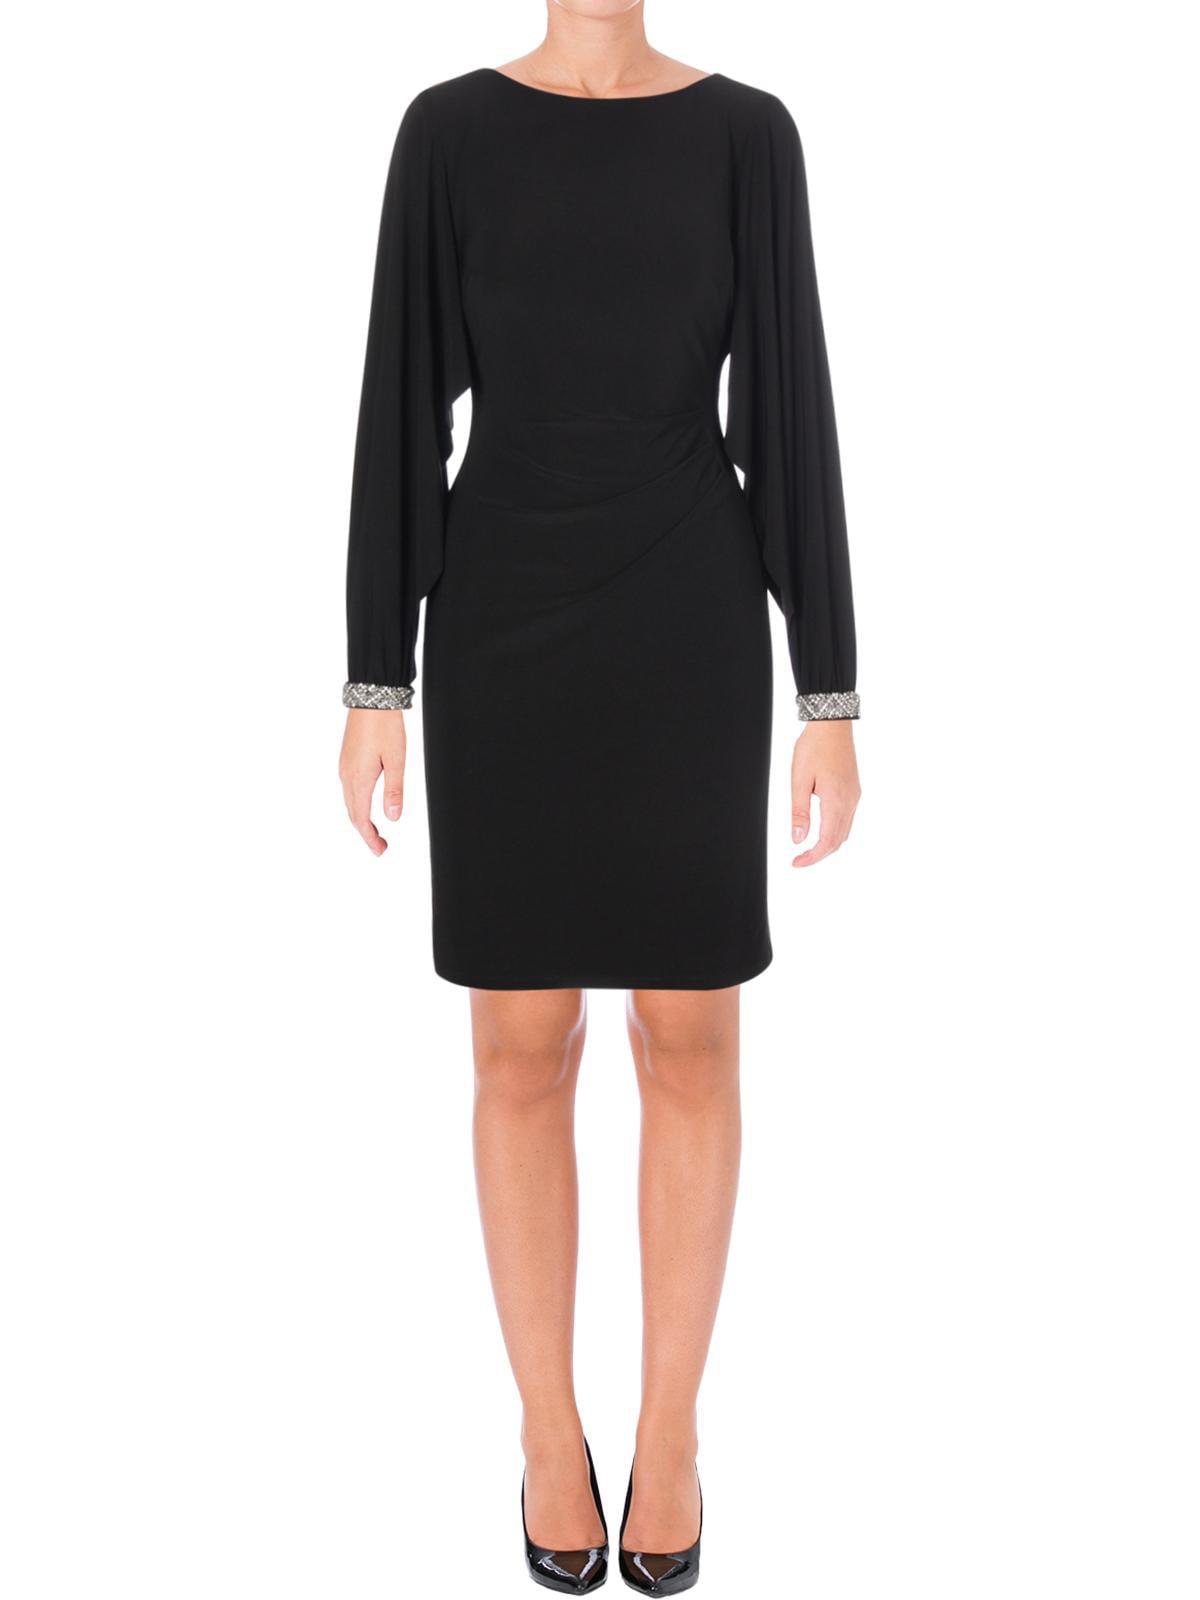 Lauren Ralph Lauren Womens Spark Embellished Cuff Sleeves Cocktail Dress